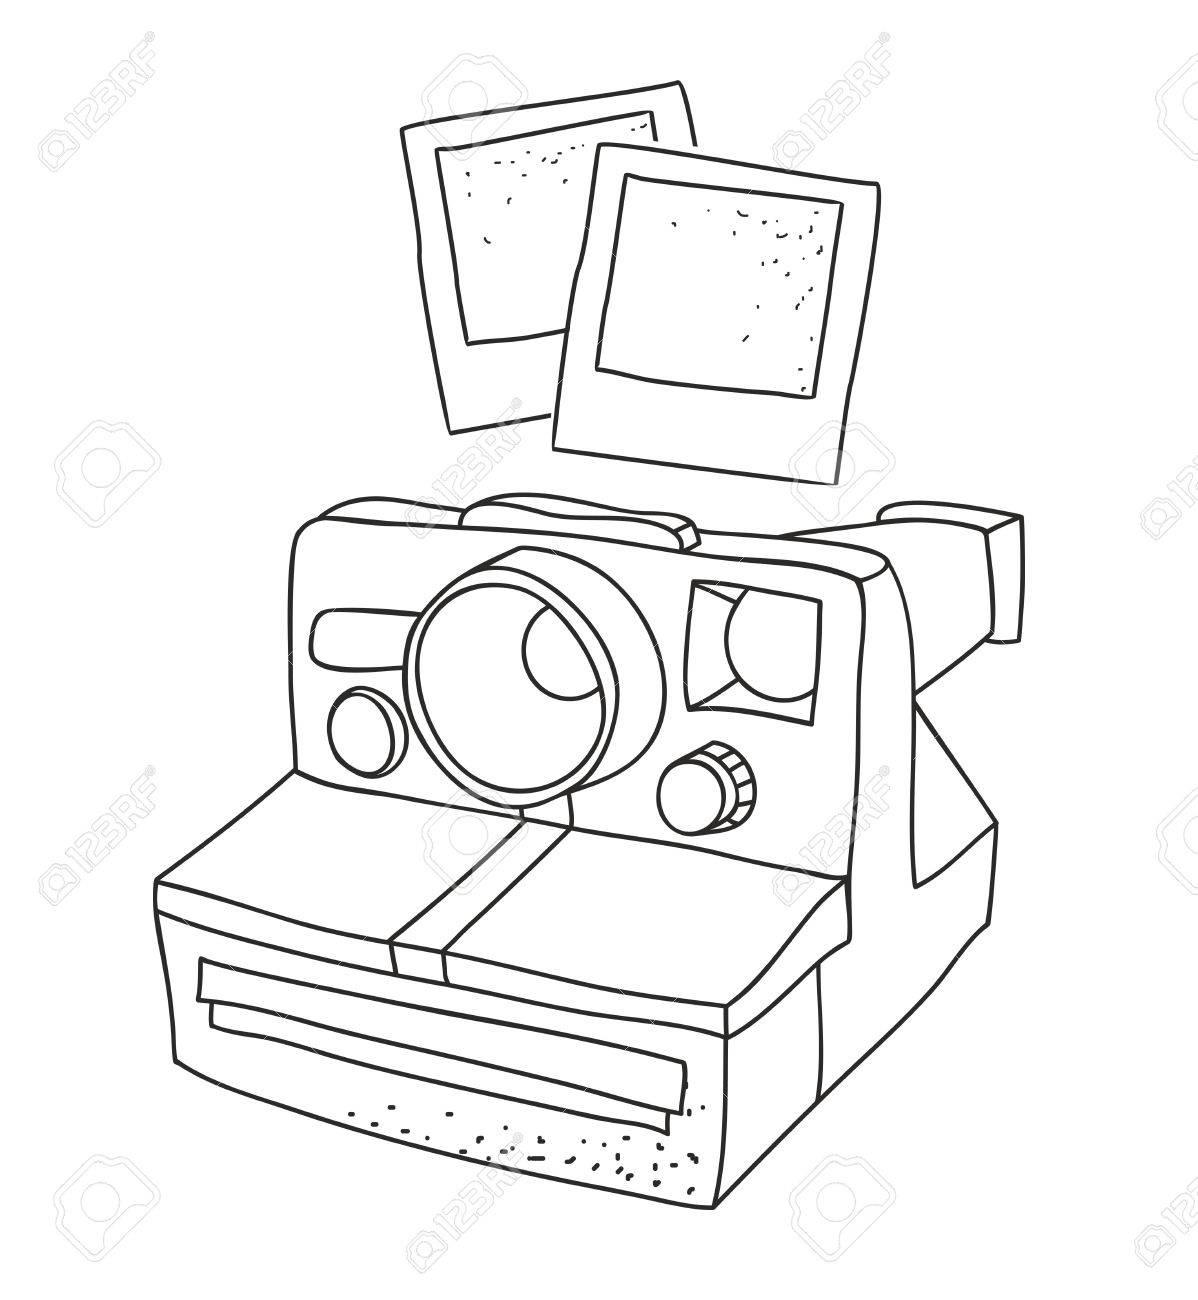 Dibujos Para Colorear Telefonos Antiguos Apanageetcom